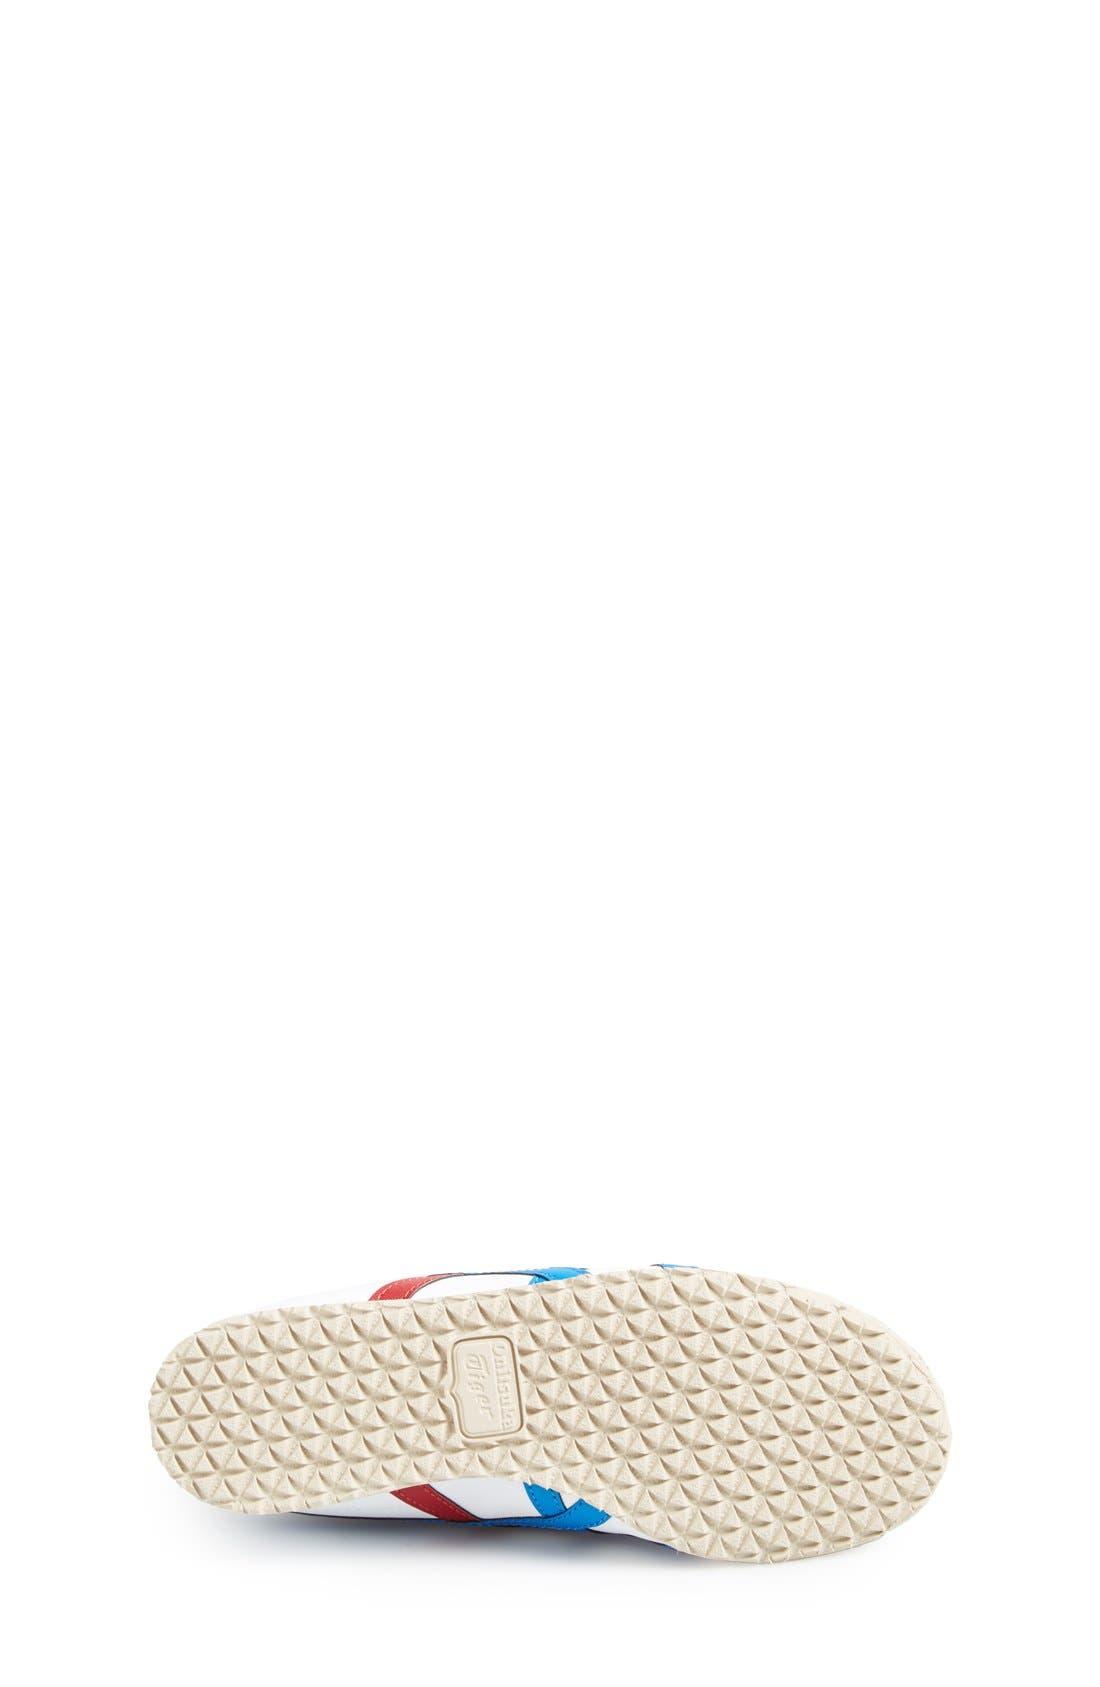 Alternate Image 2  - Onitsuka Tiger™ 'Mexico 66 Baja' Sneaker (Toddler, Little Kid & Big Kid)